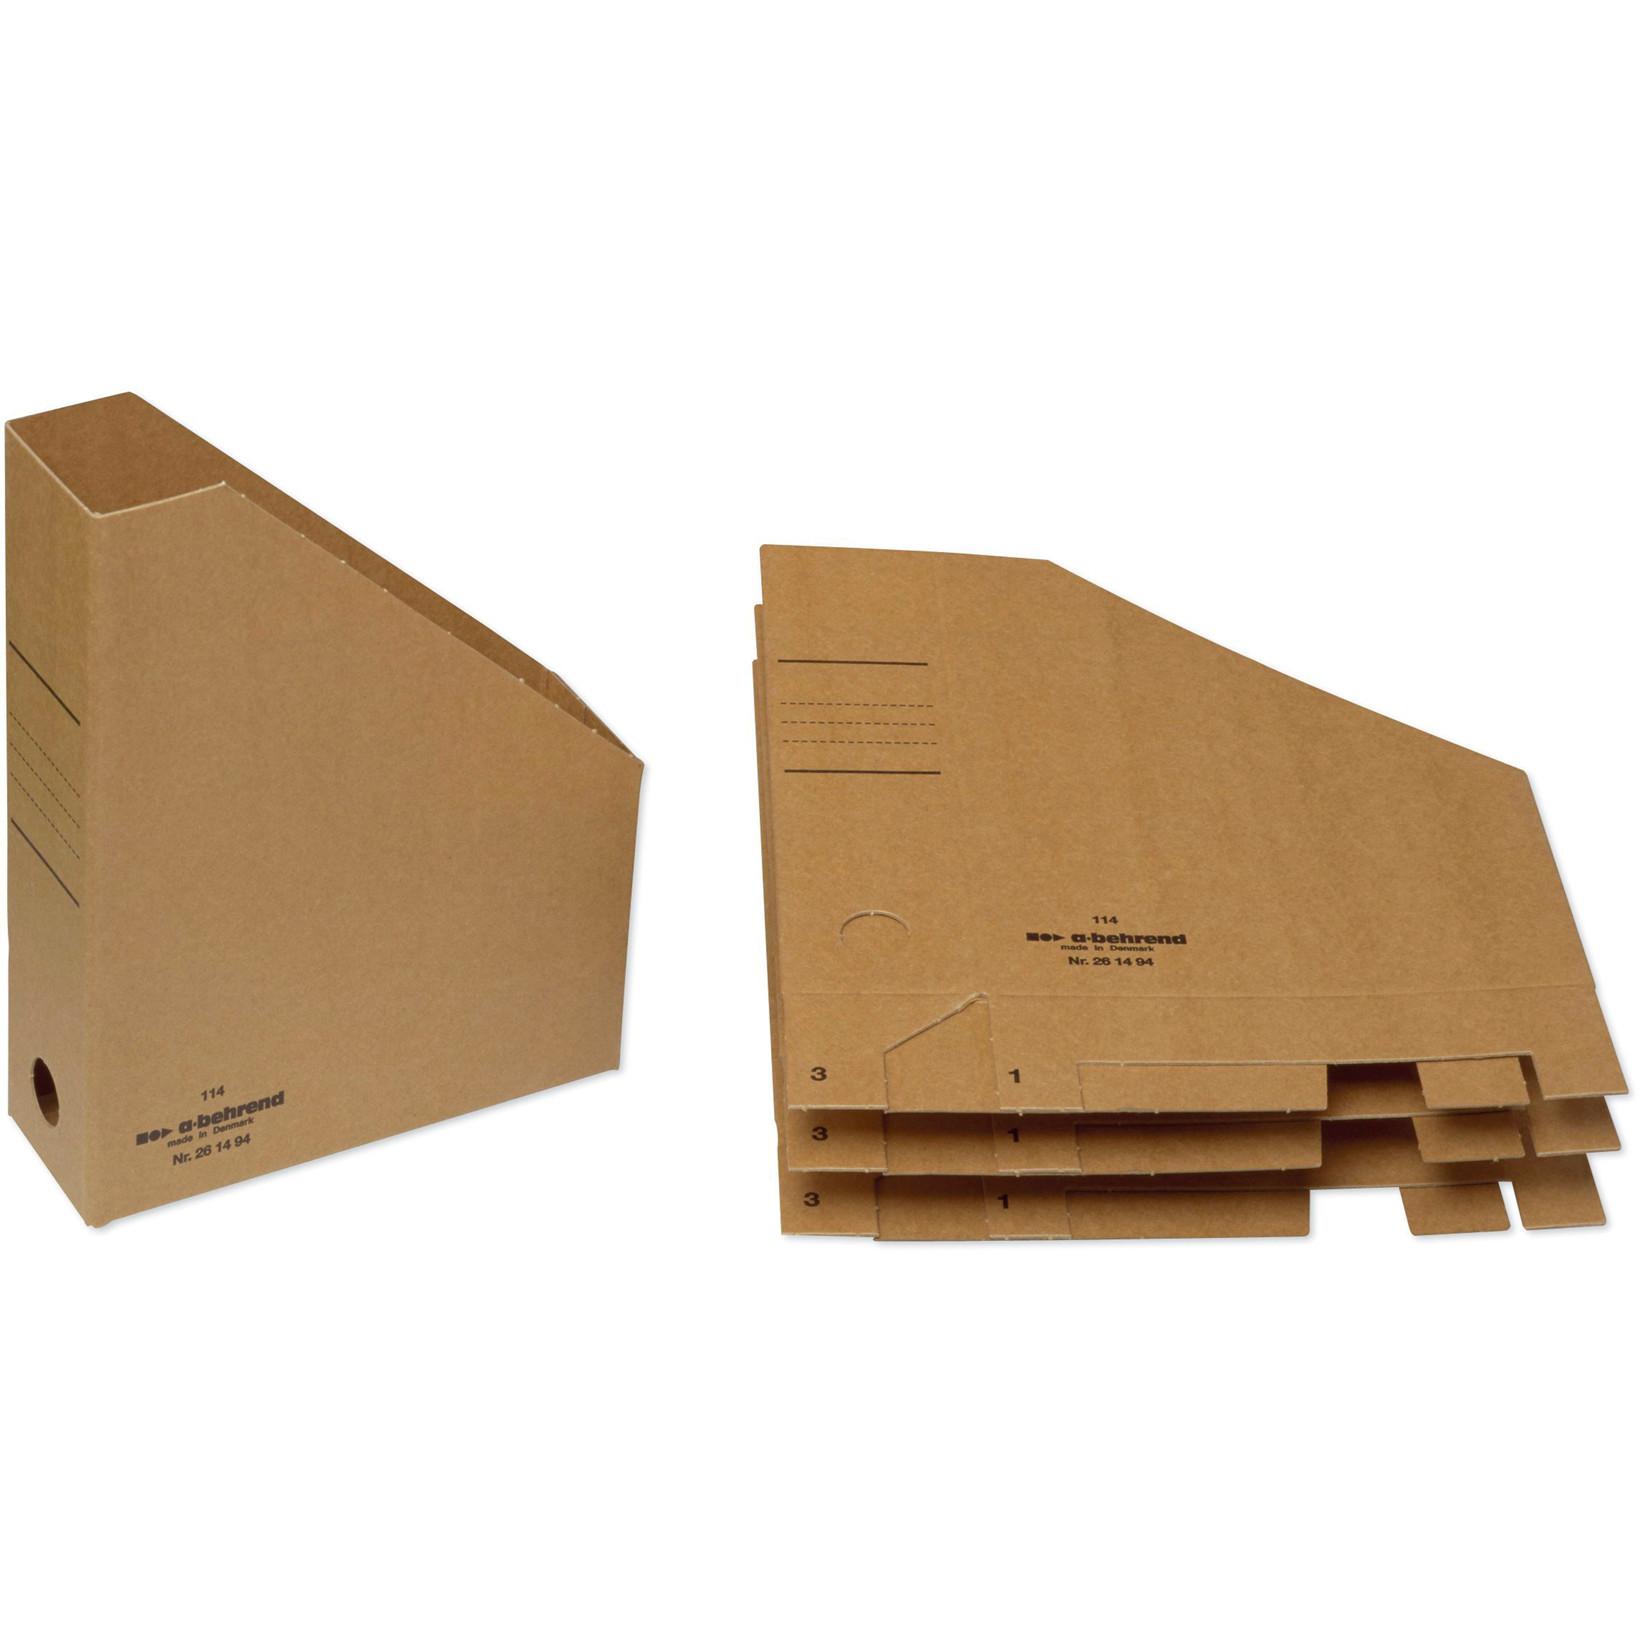 Bantex tidsskriftholder A4 med 75 mm ryg - Brun pap